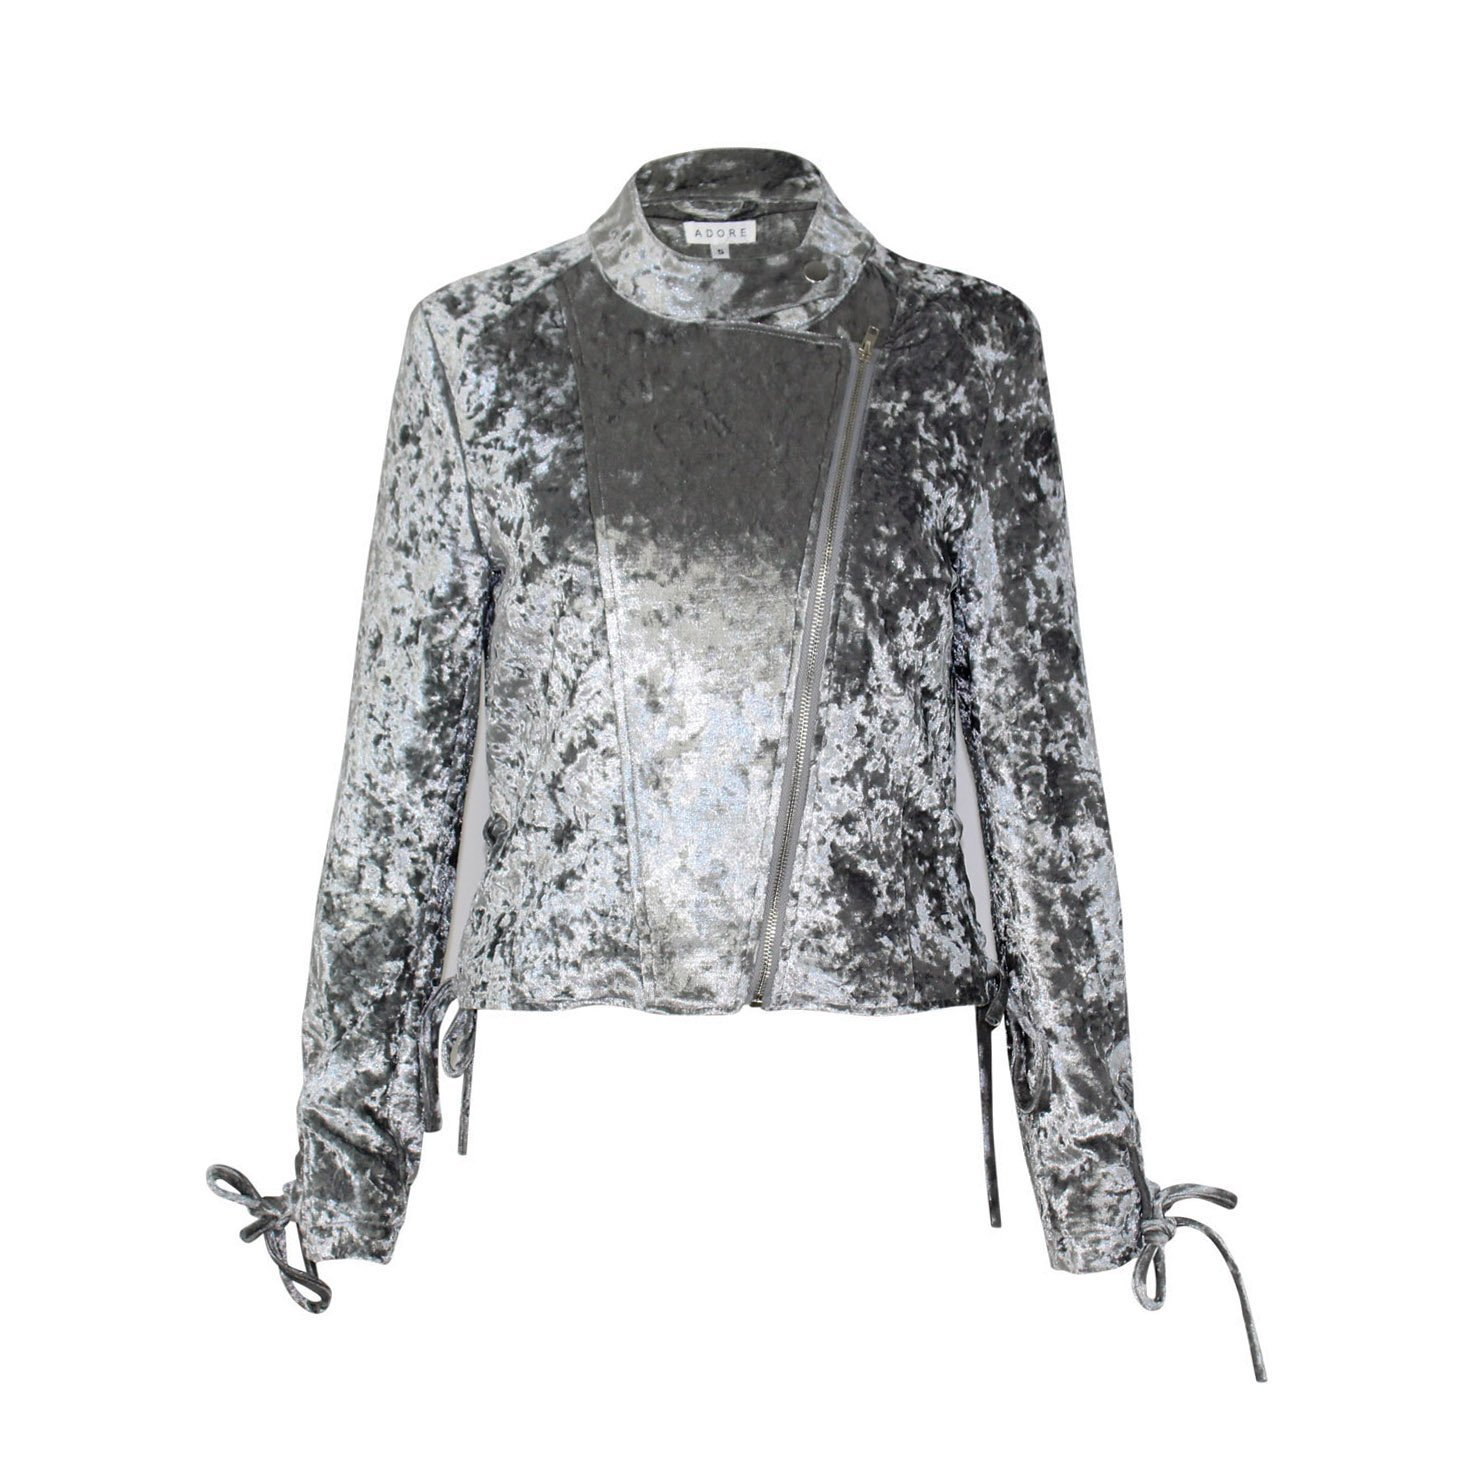 Adore Crushed Velvet Moto Jacket | Muse Boutique Outlet – Muse Outlet